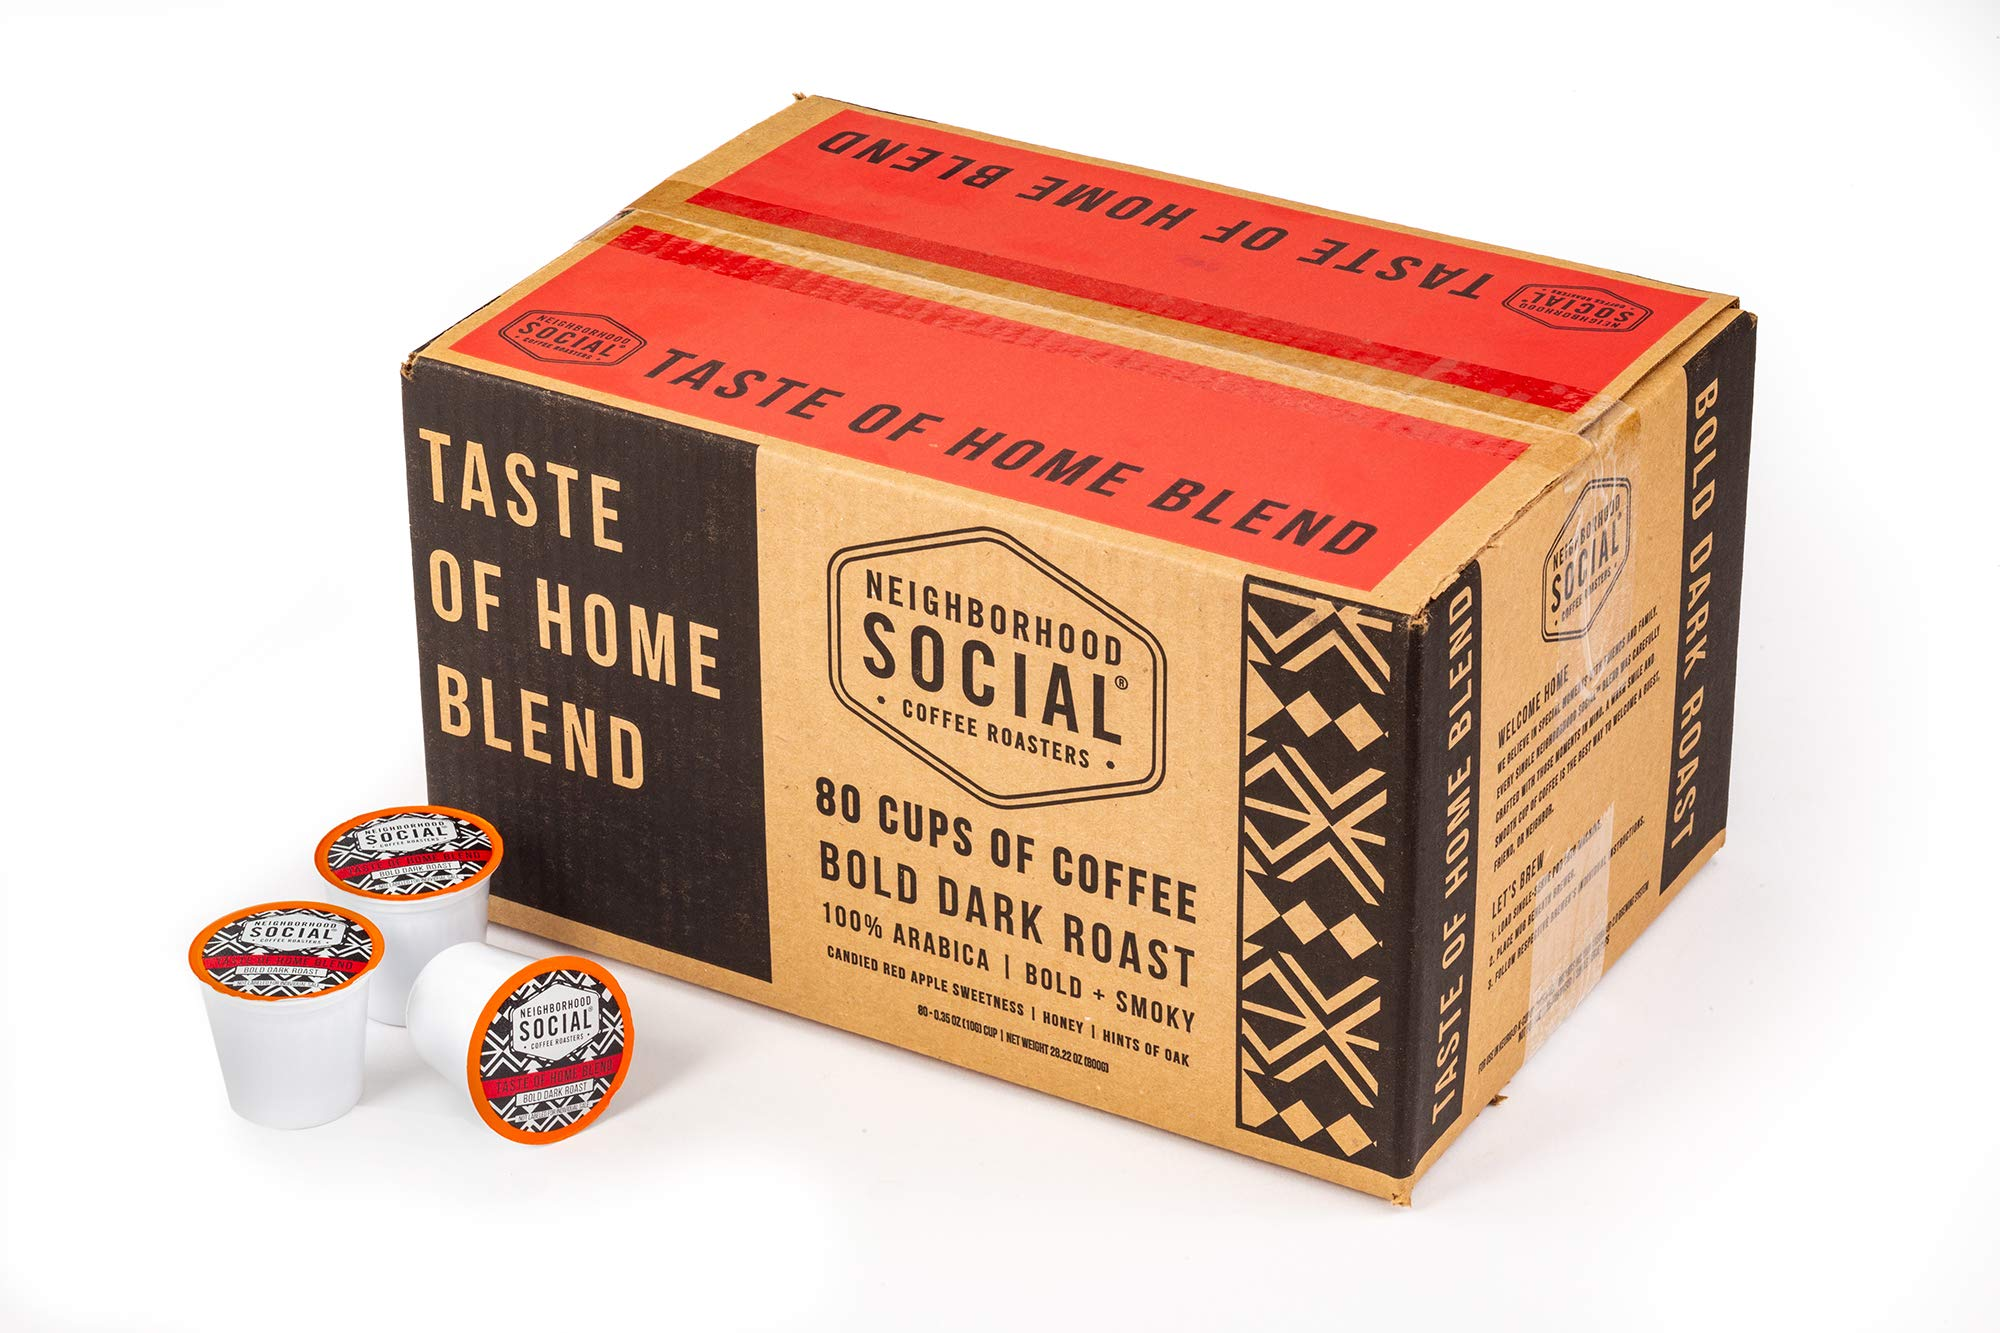 Neighborhood Social, Taste of Home Bold Dark Roast Gourmet Coffee, 80 count Single Serve Cups by Neighborhood Social